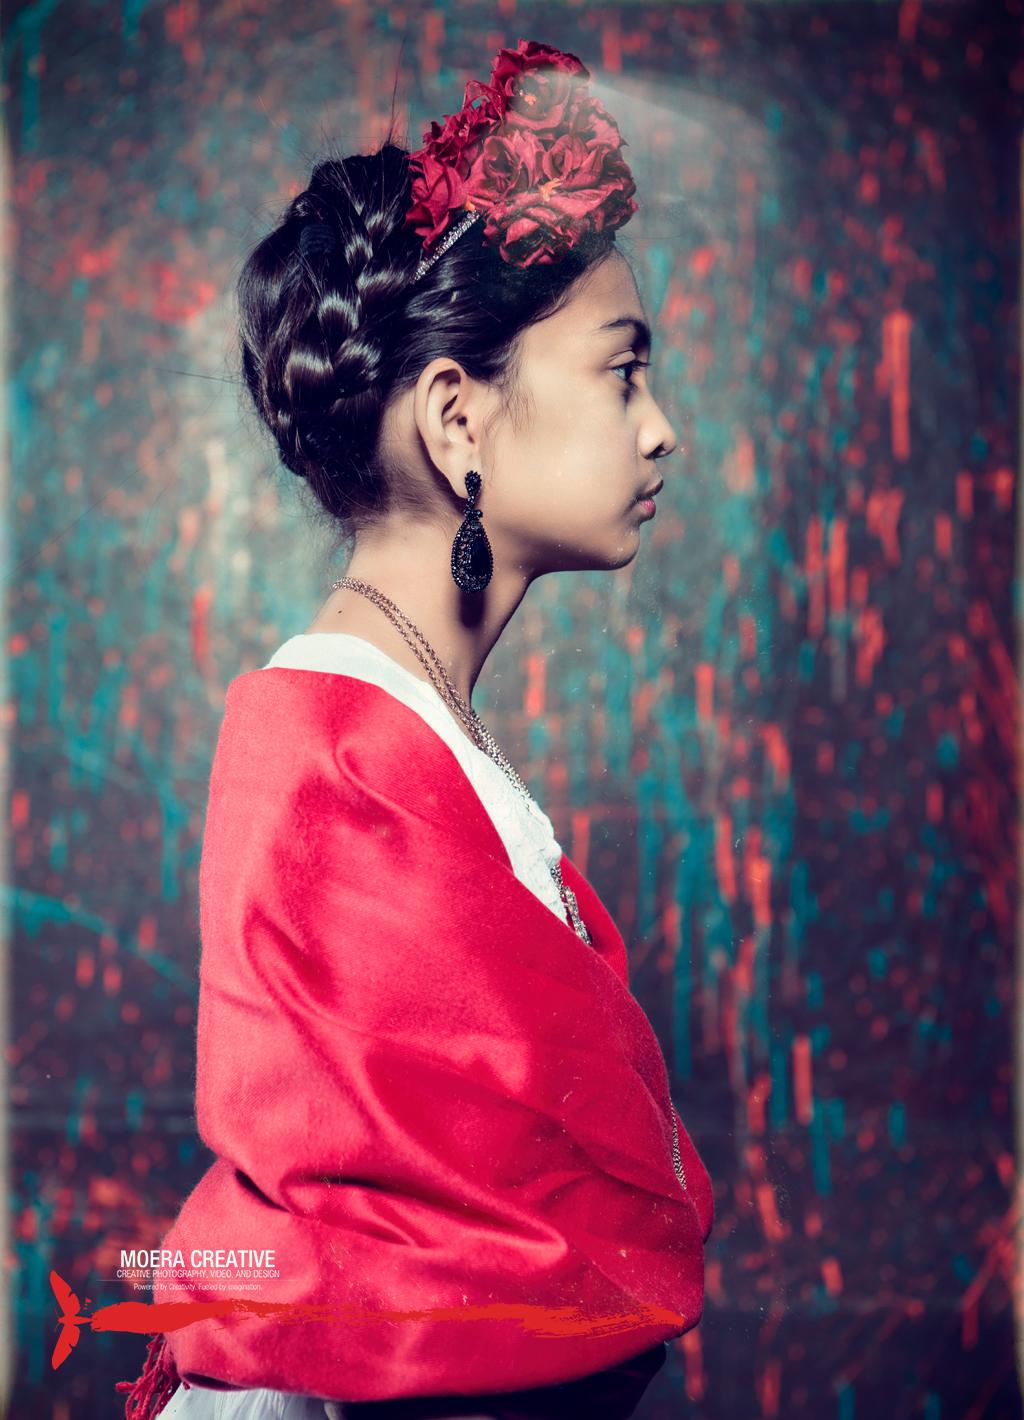 Moya - Frida Kahlo